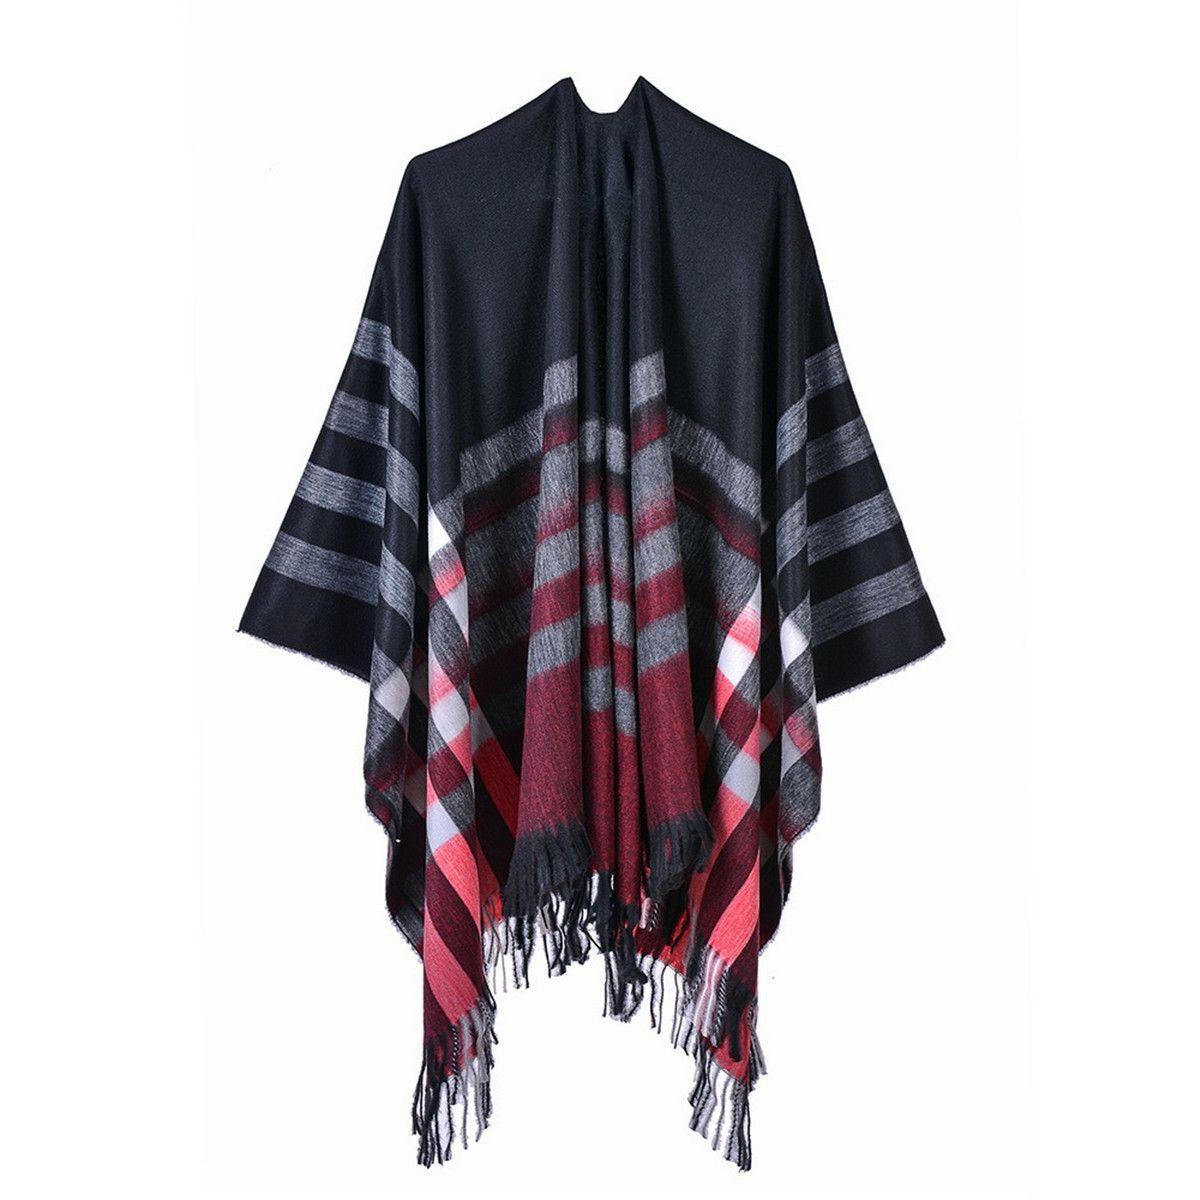 Scarf Wrap Shawl Gift Infinity - 2020 Travel Poncho Fashion